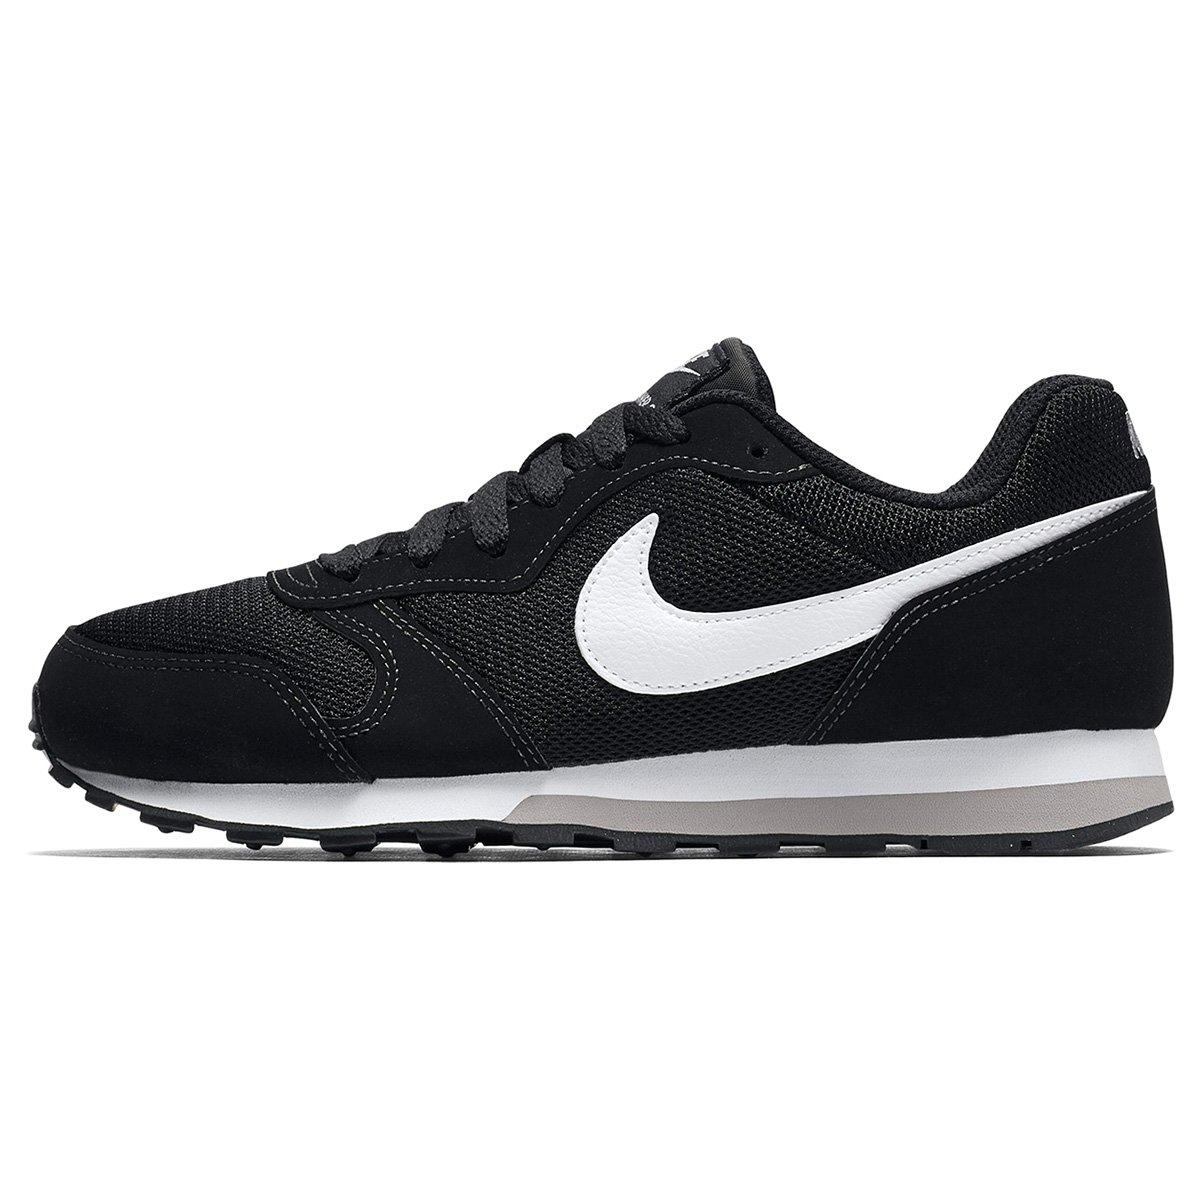 05c89f0b03ed5 Tênis Infantil Nike Md Runner 2 - Preto